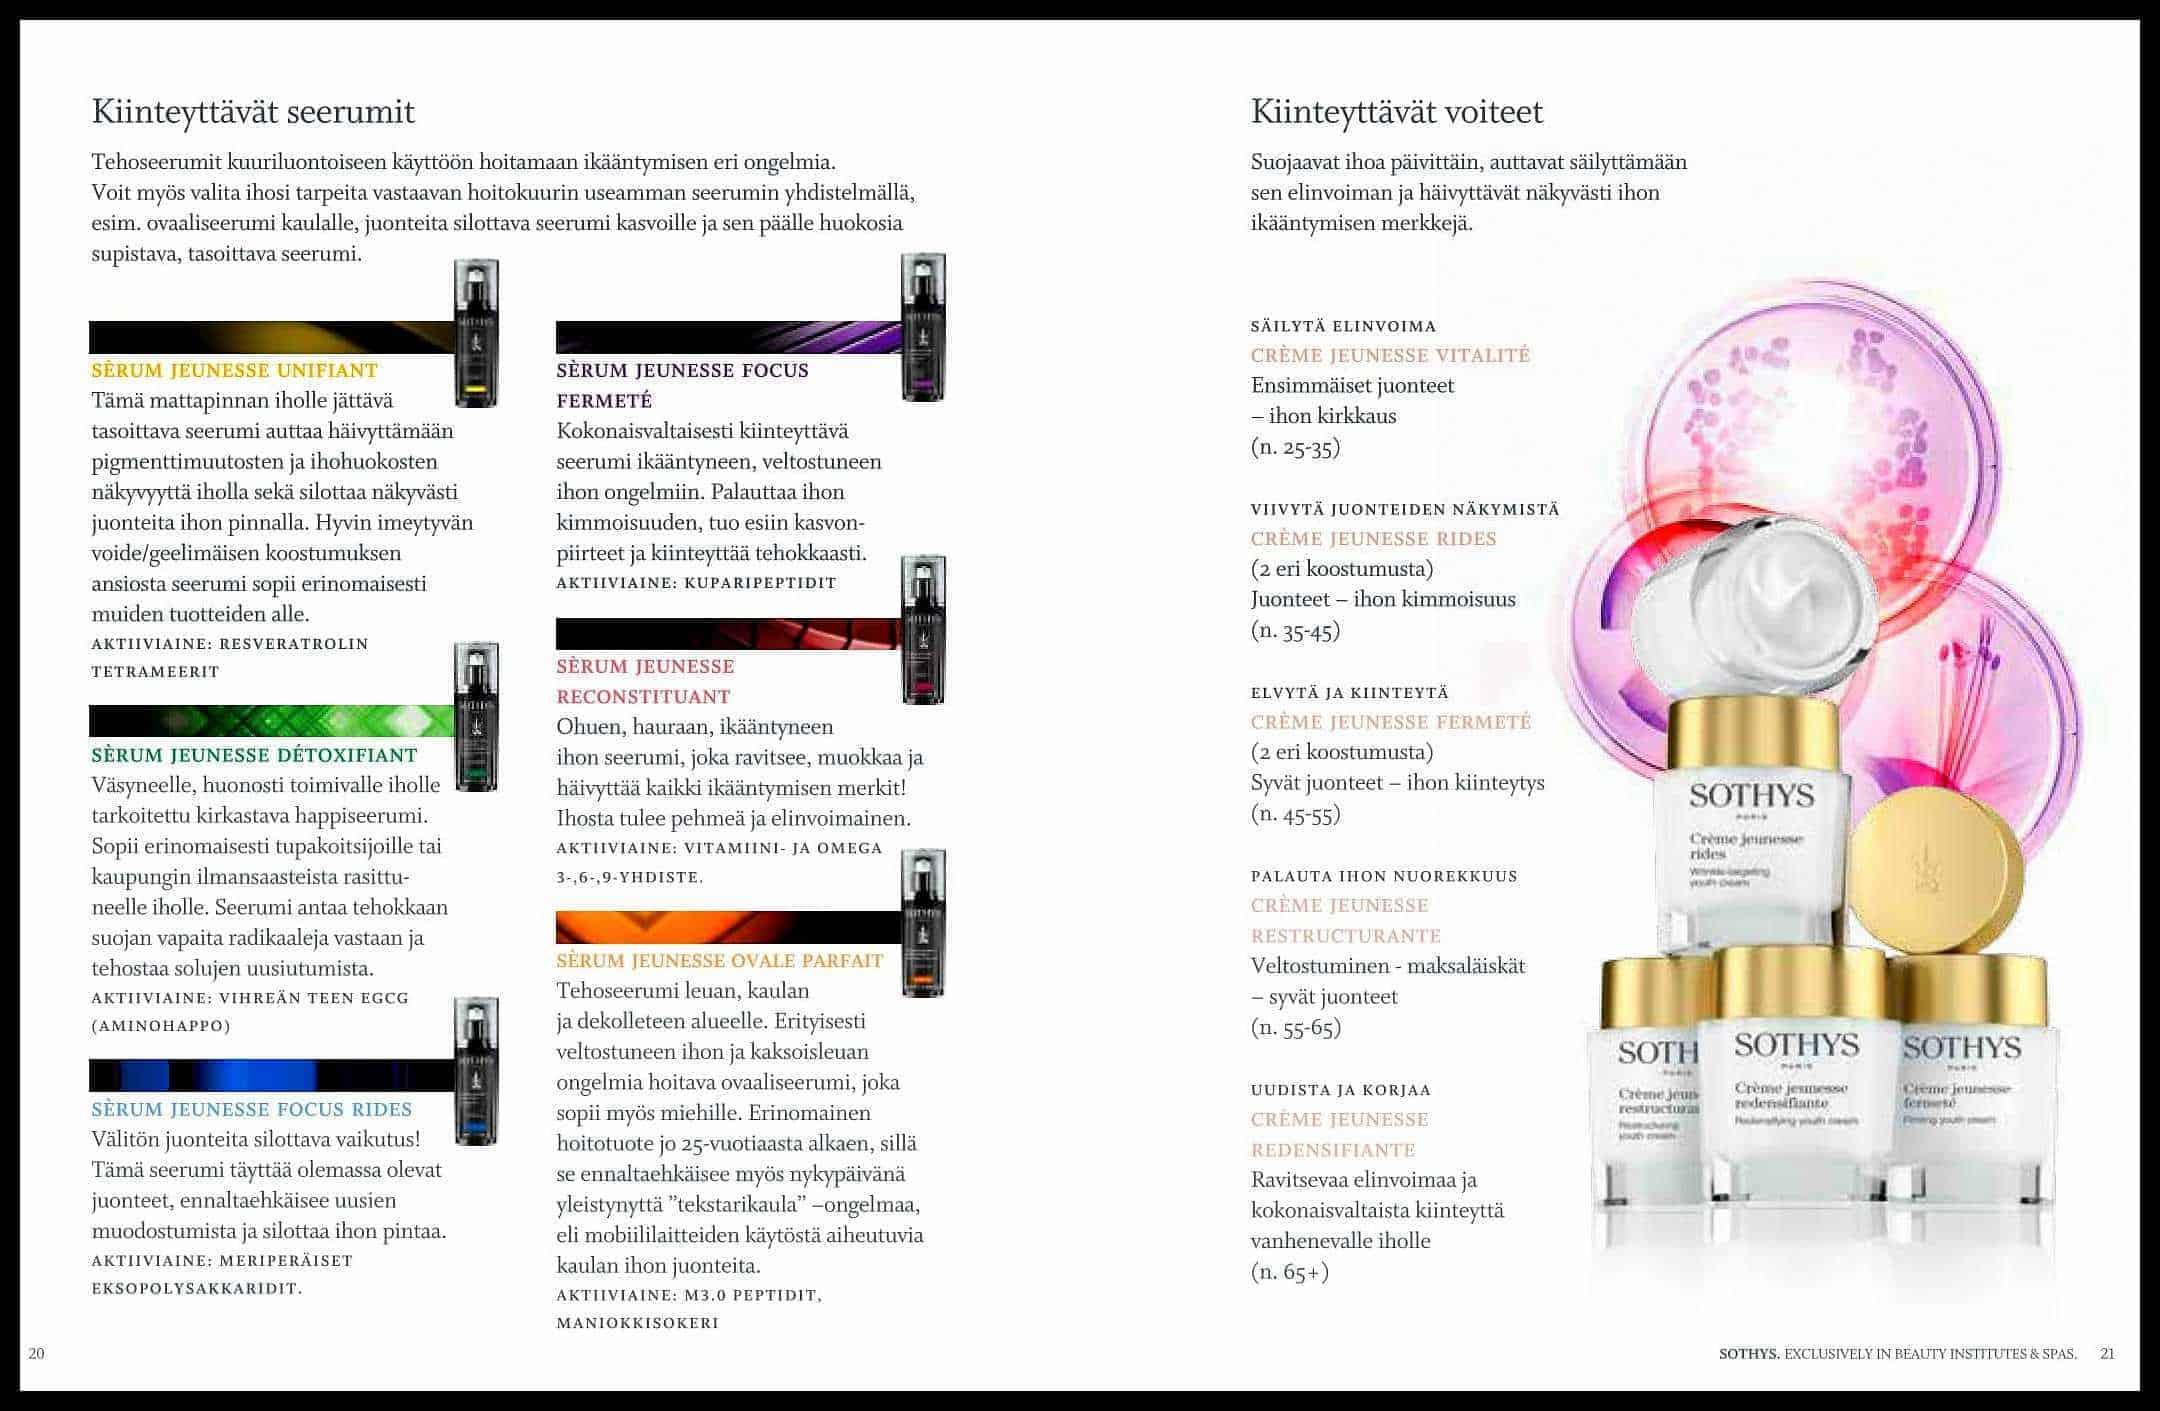 SOTHYS βB3 TRI COMPLEX™ Esite sivu 20 Kauneushoitola BellaHelena Oulu Finland